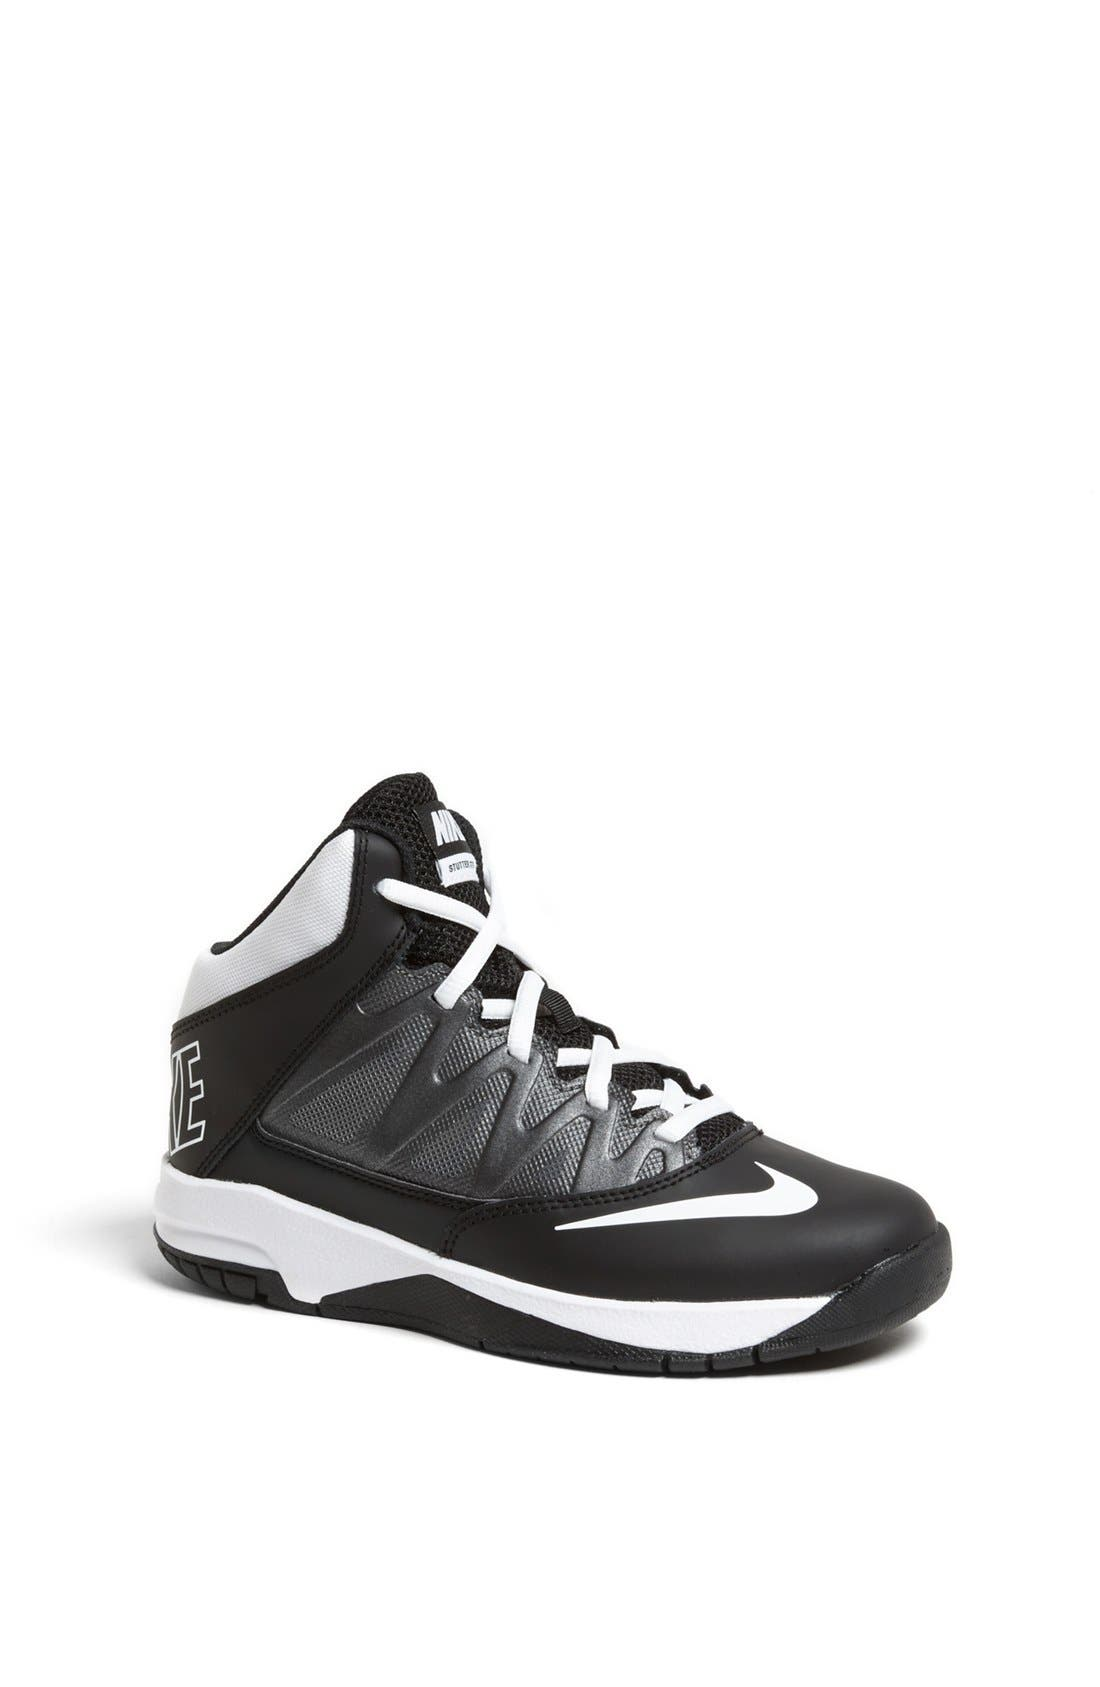 'Stutter Step' Basketball Shoe,                             Main thumbnail 1, color,                             001